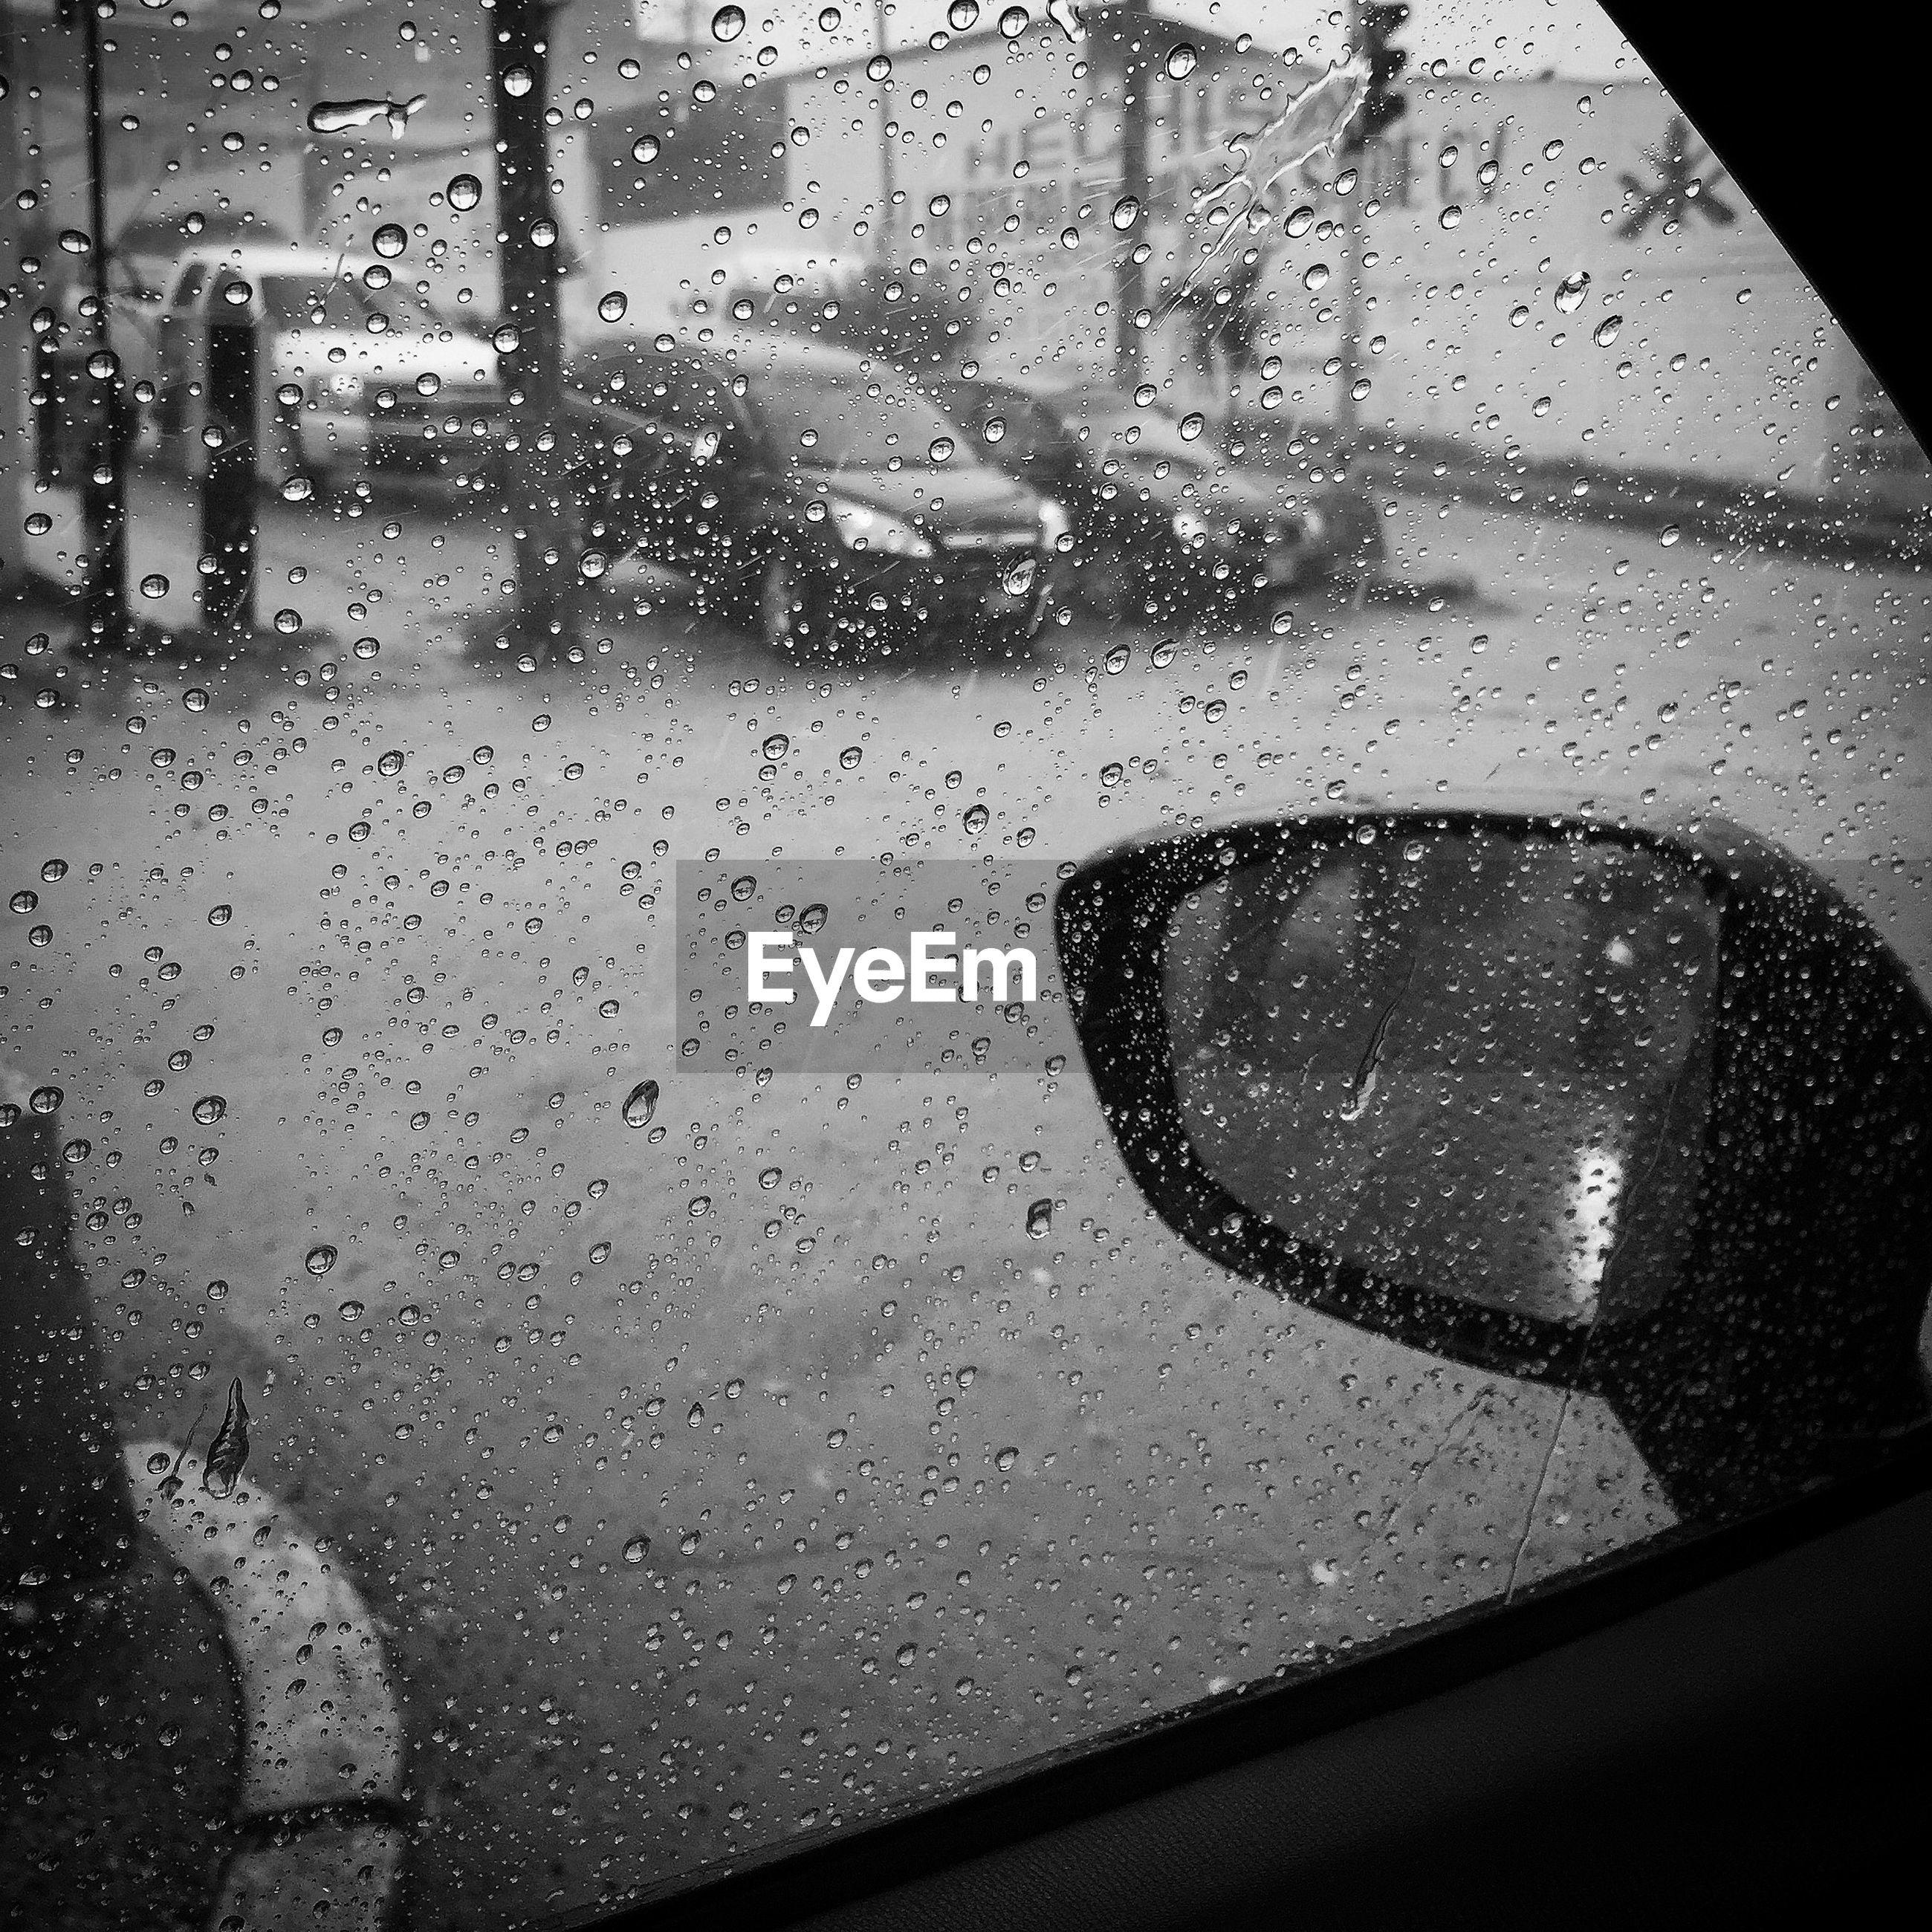 drop, wet, water, glass - material, window, transparent, indoors, rain, raindrop, season, glass, close-up, weather, car, monsoon, vehicle interior, rainy, looking through window, day, reflection